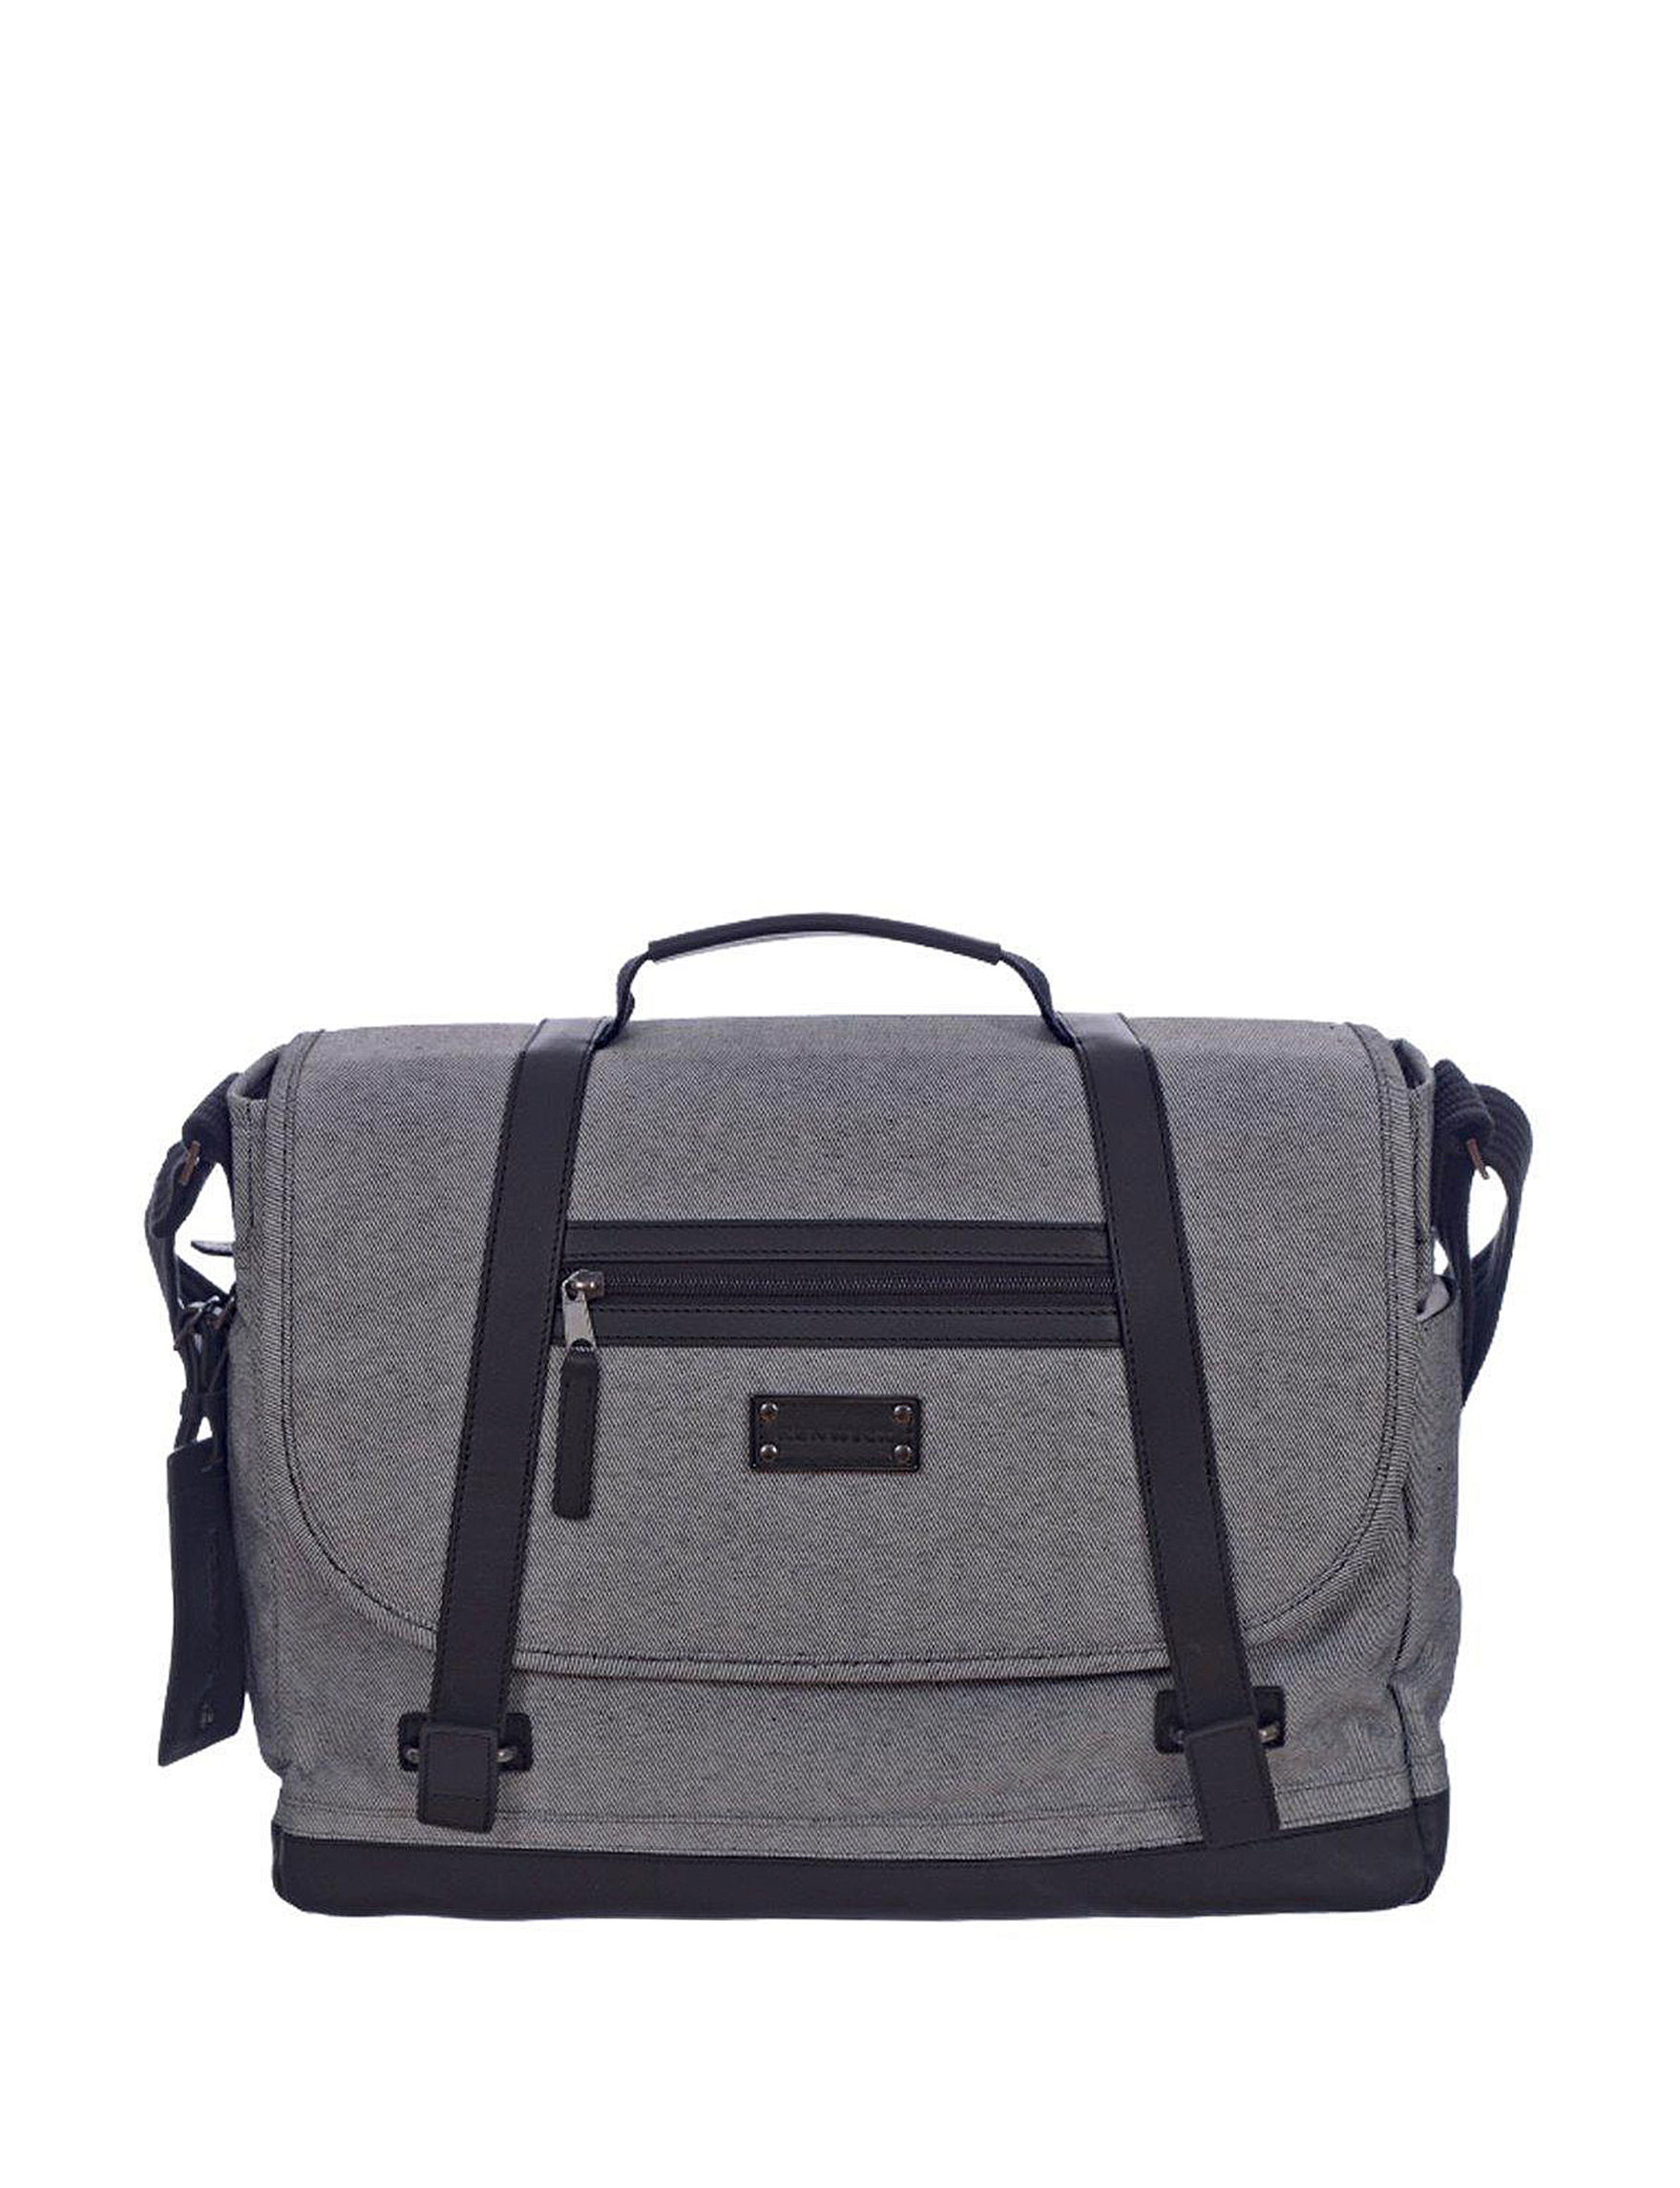 Cosmopolitan Grey Laptop & Messenger Bags